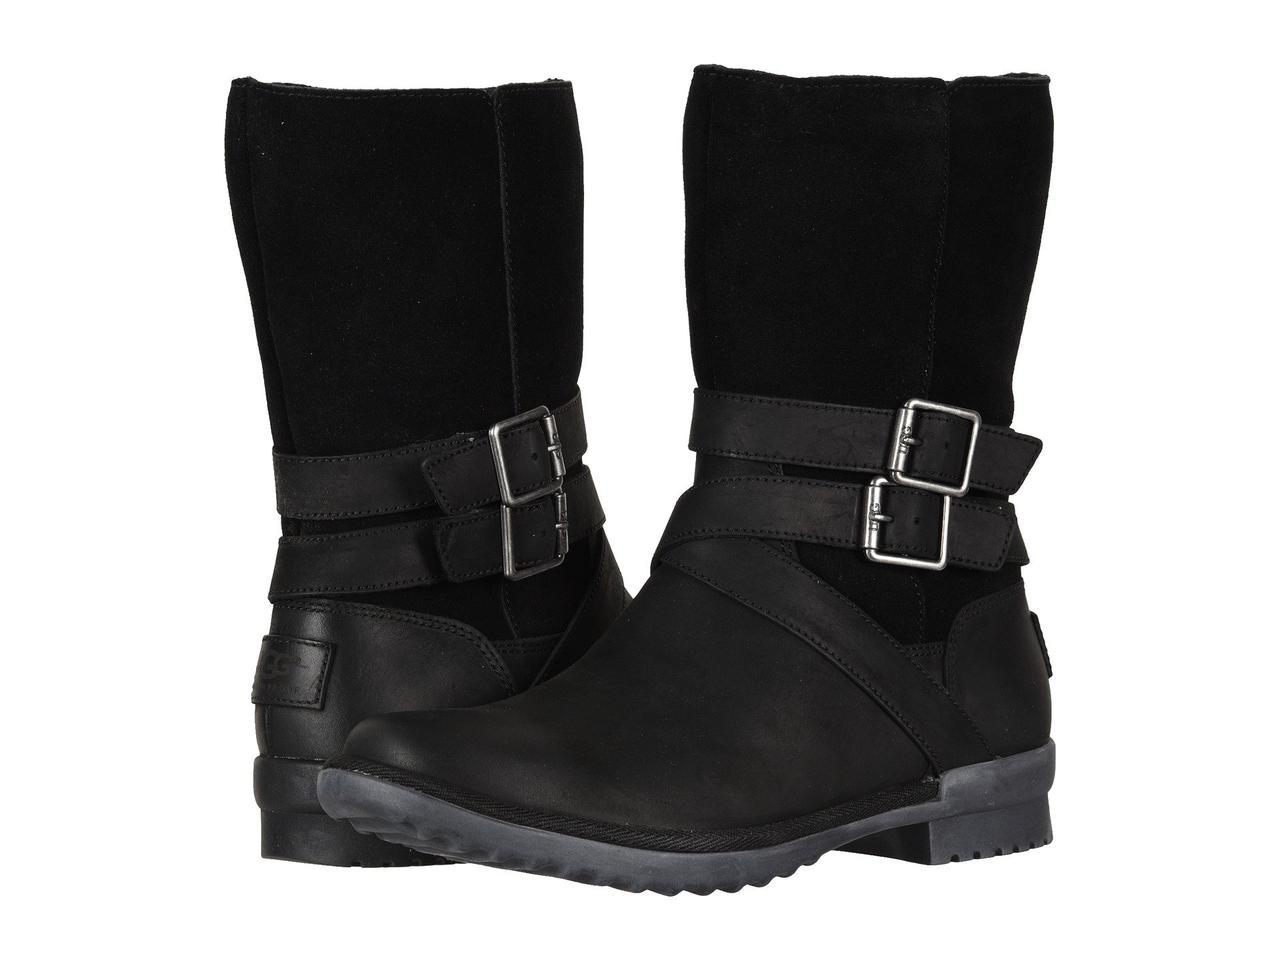 Ботинки/Сапоги (Оригинал) UGG Lorna Boot Black